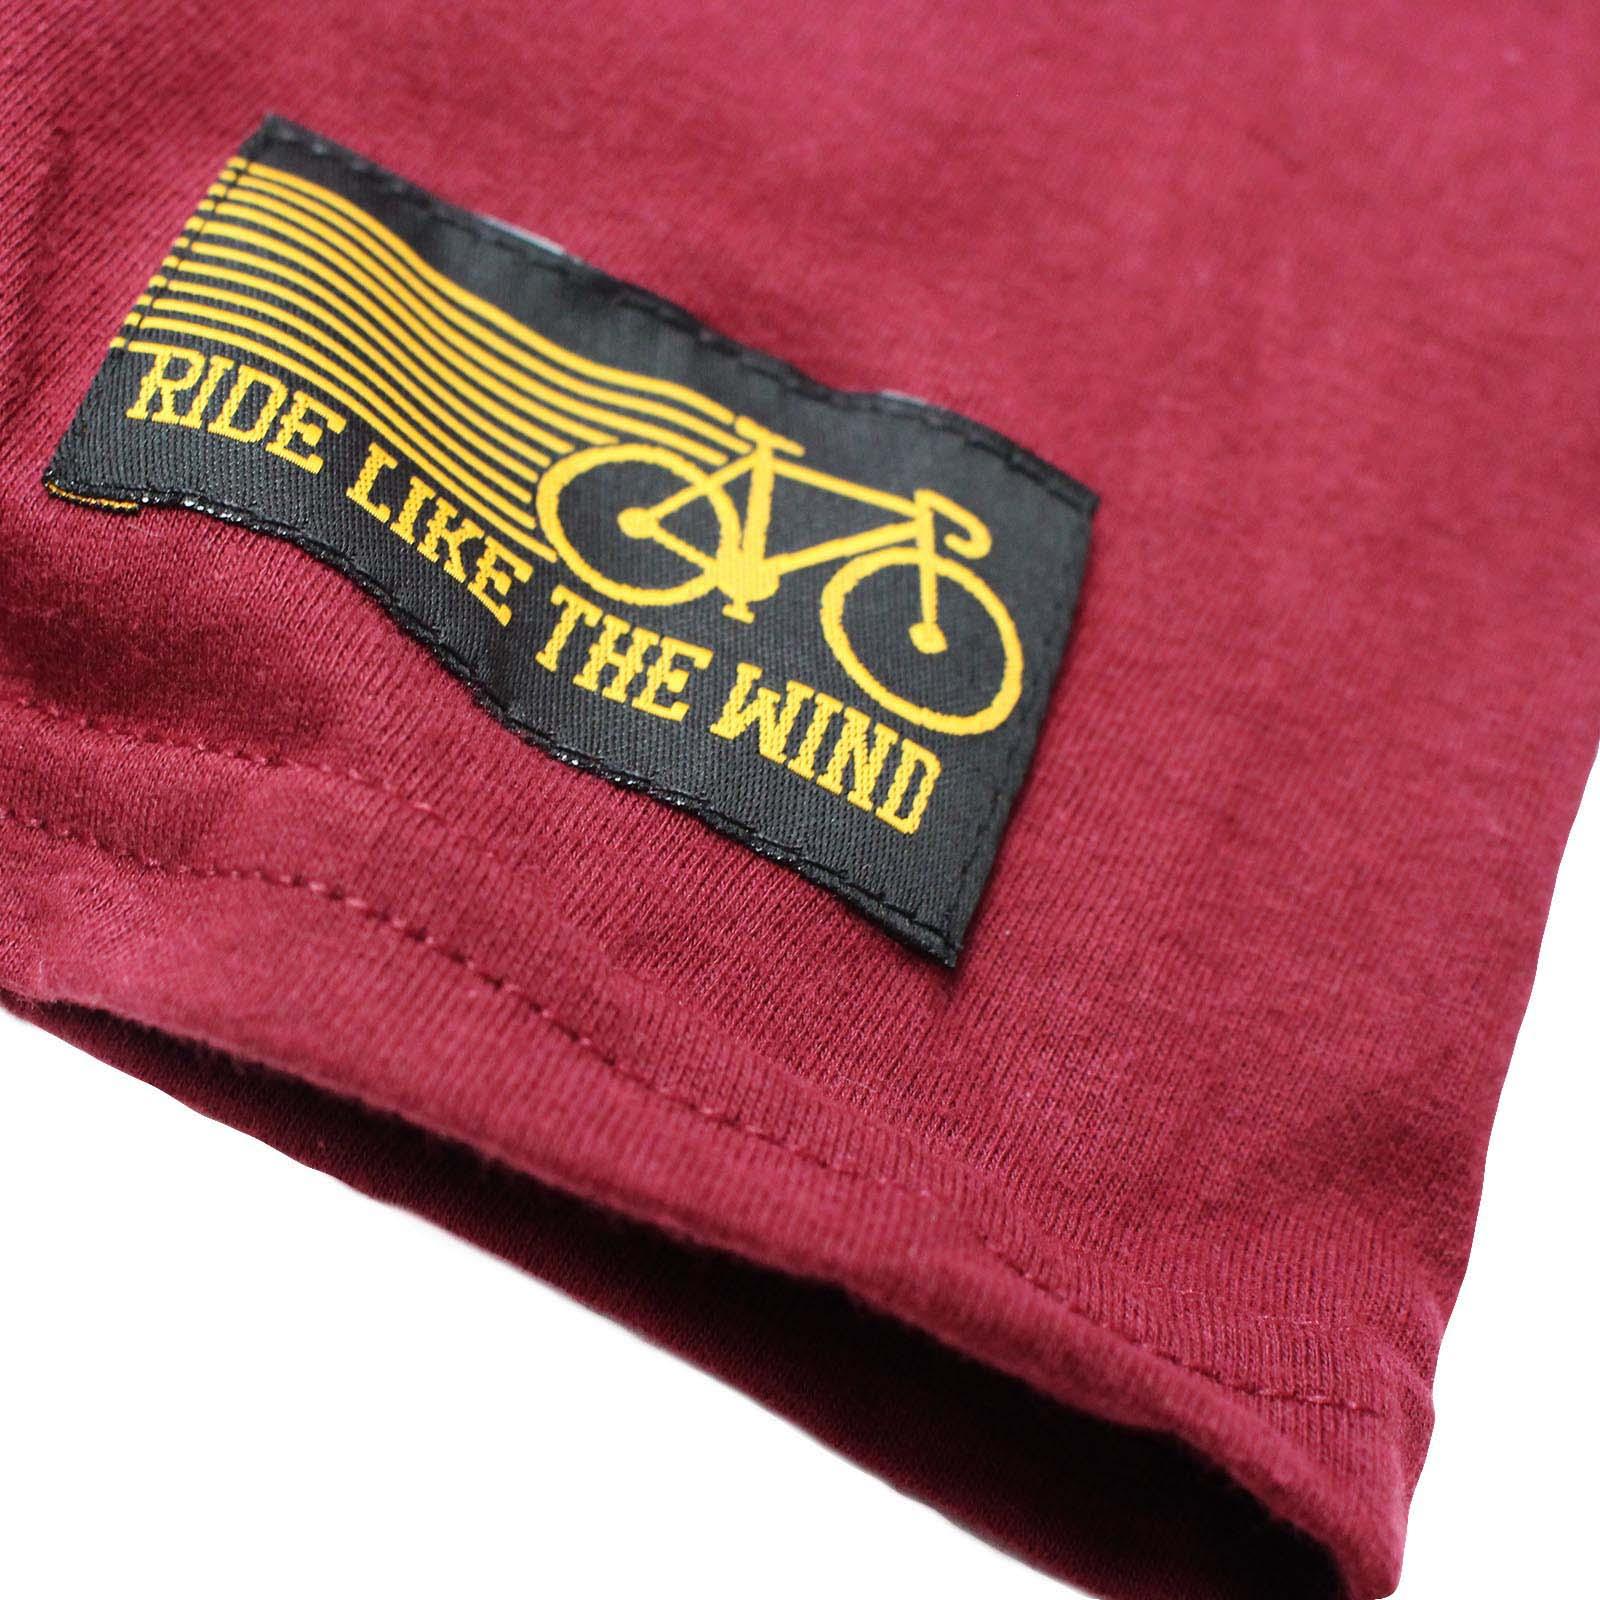 Cycling-Yeah-My-Bike-Did-Cost-More-funny-top-Birthday-tee-T-SHIRT-T-SHIRT thumbnail 17